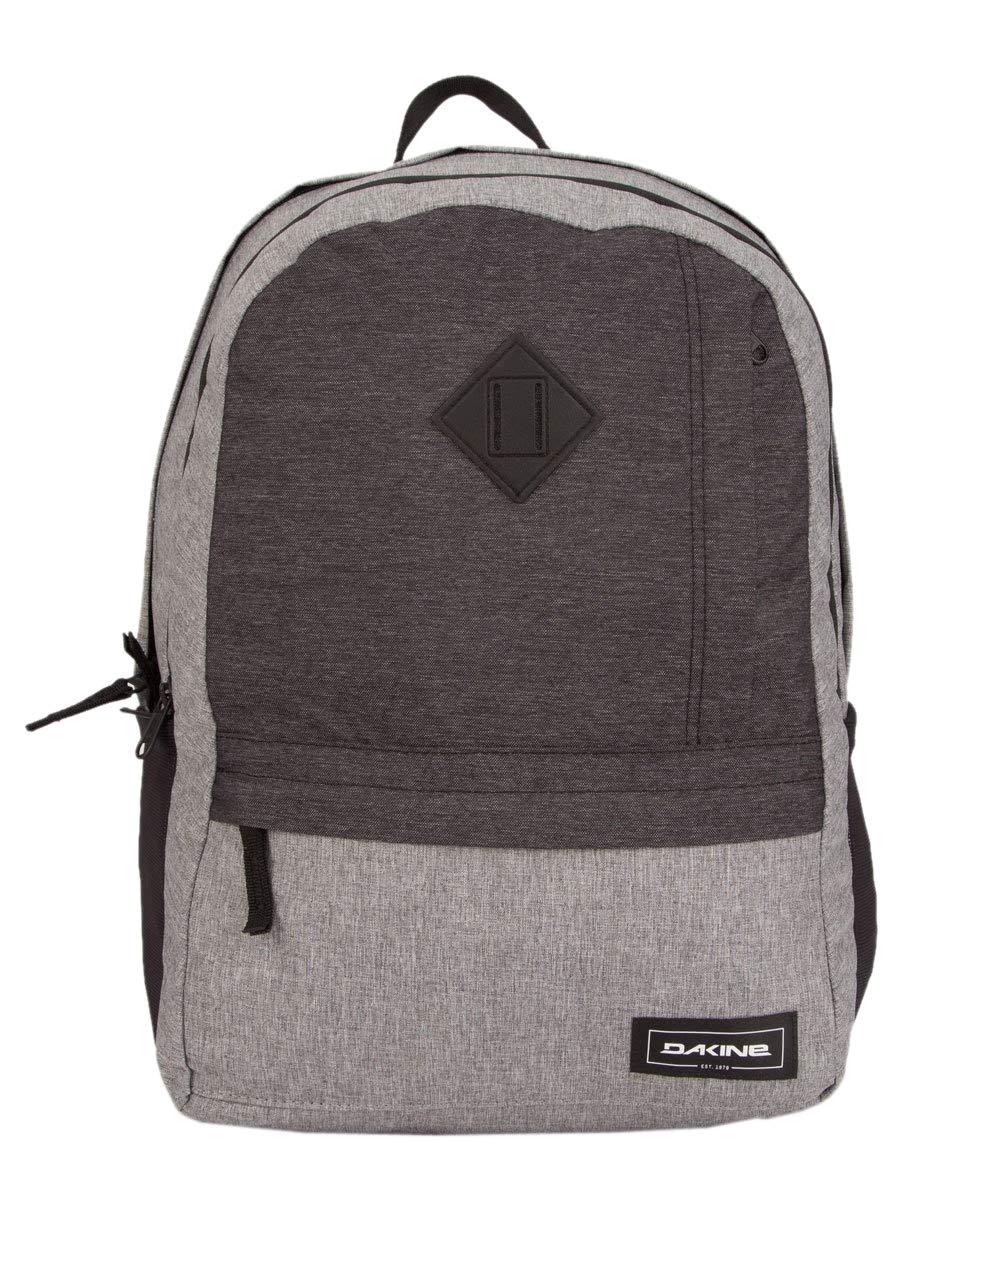 Dakine Unisex Essentials Pack Backpack, Greyscale, 22L by Dakine